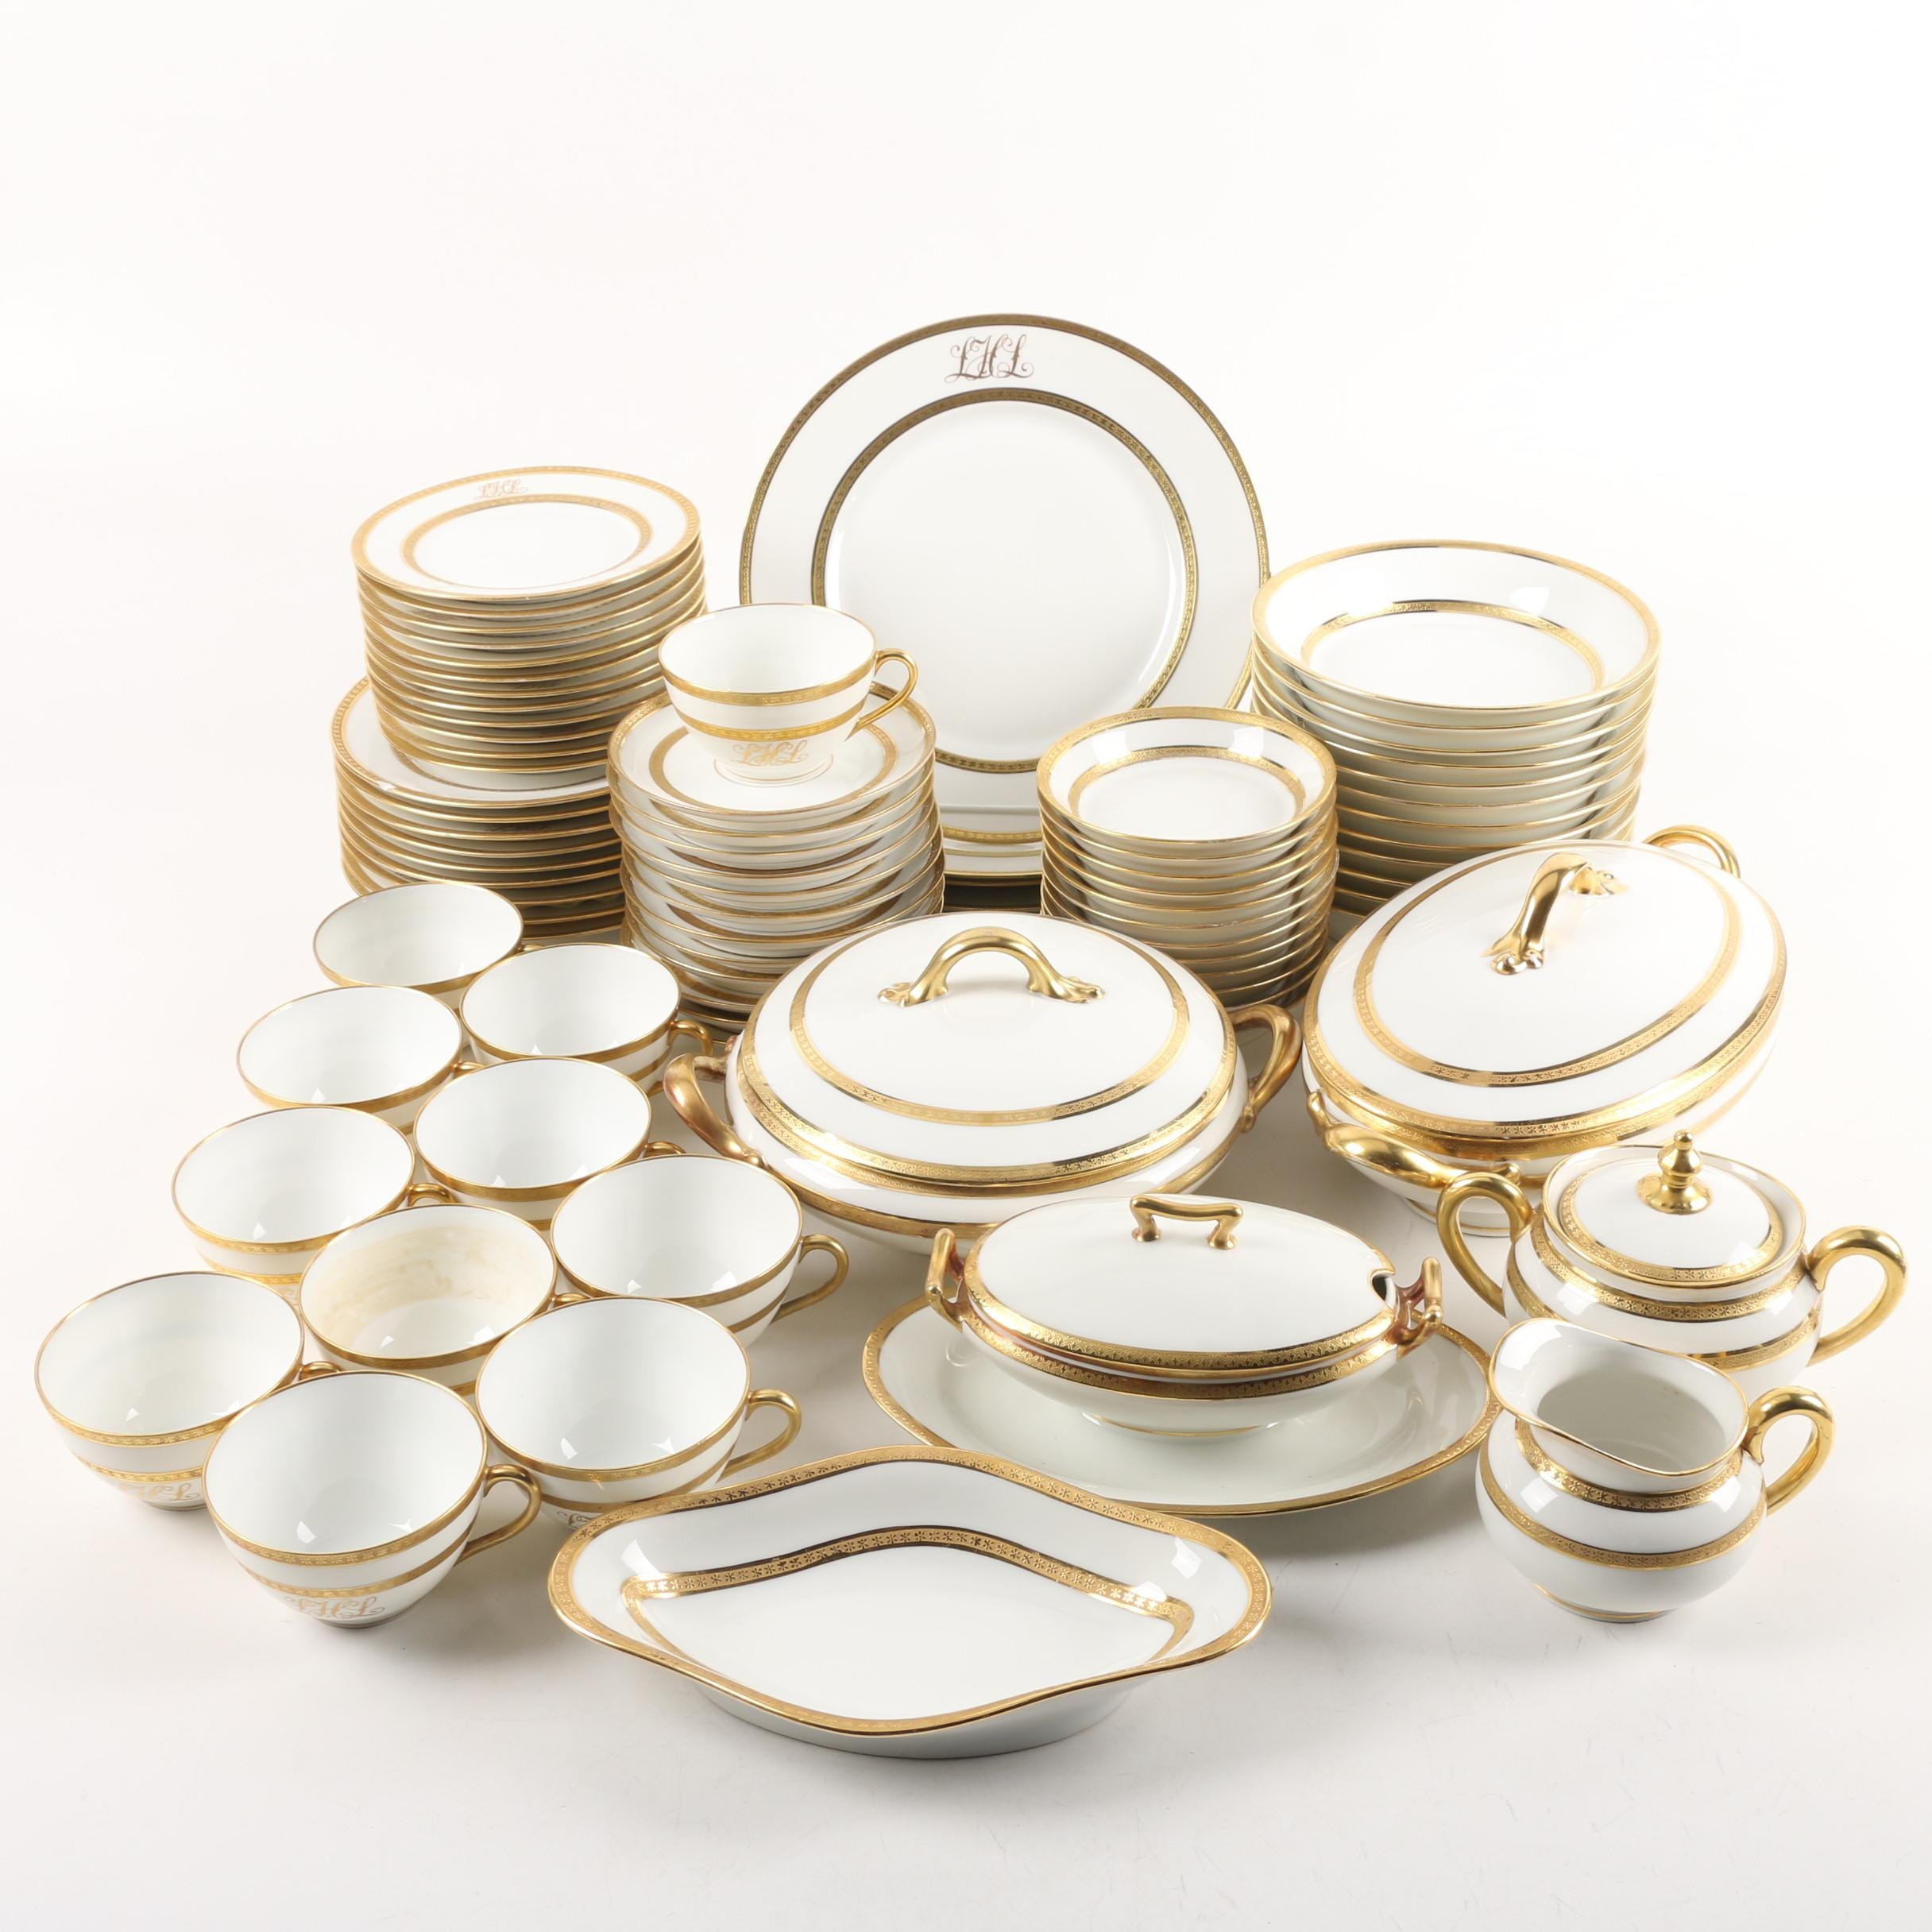 Paroutaud Fréres Limoges Monogrammed Porcelain Tableware